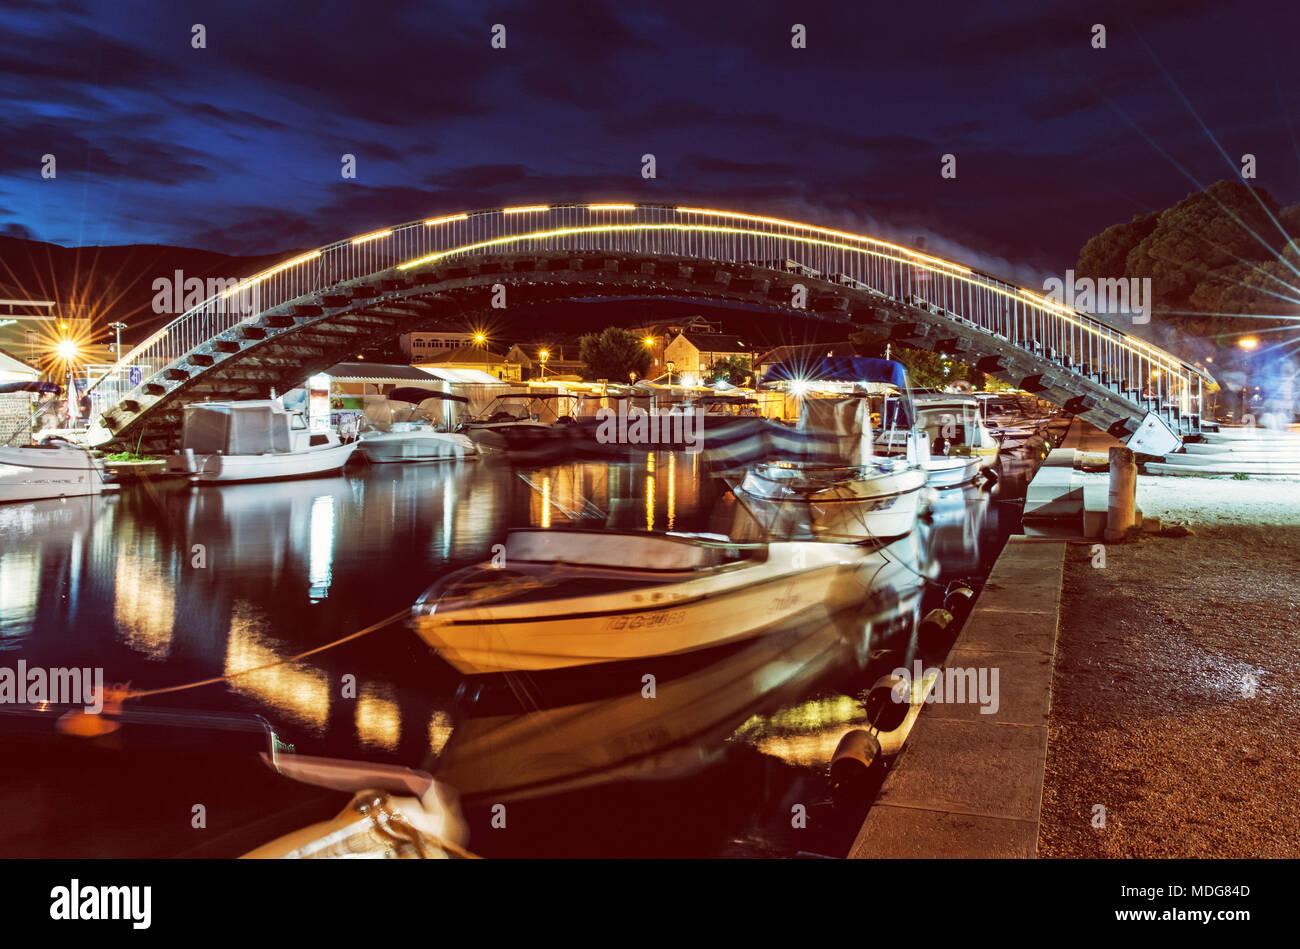 Arched bridge for pedestrians in Trogir, Croatia, Unesco. Night scene. Travel destination. Boats in the port. Yellow photo filter. Stock Photo